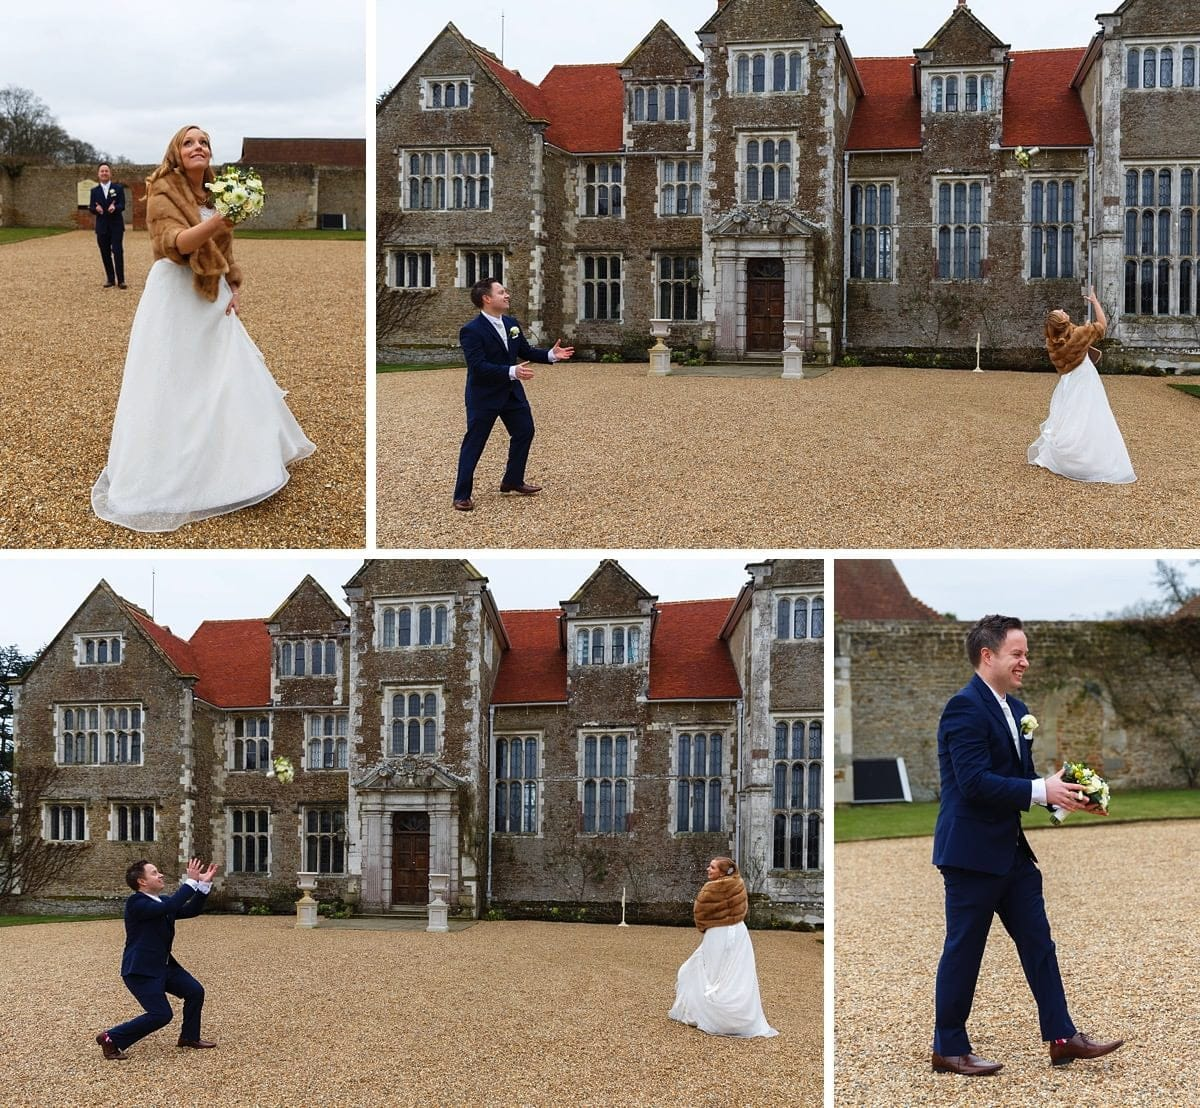 loseley-wedding-photos-067.jpg